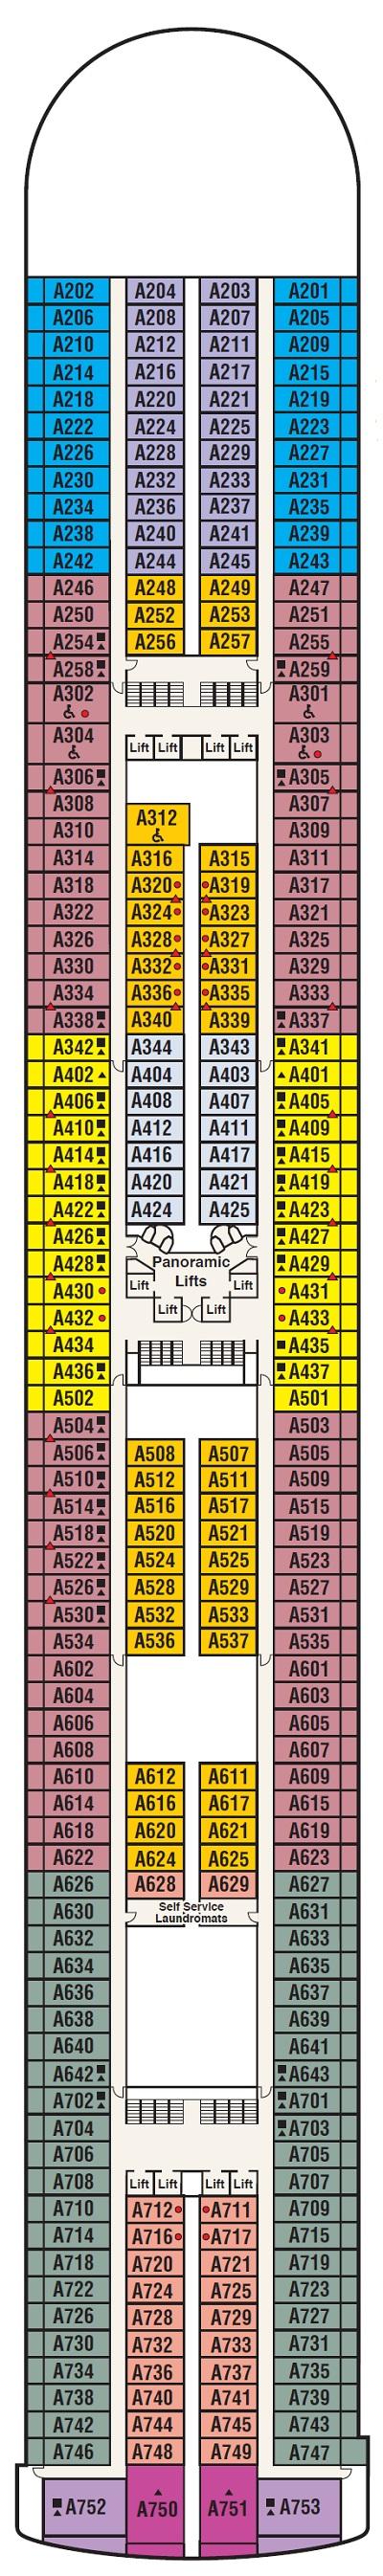 Deck 12 - Aloha